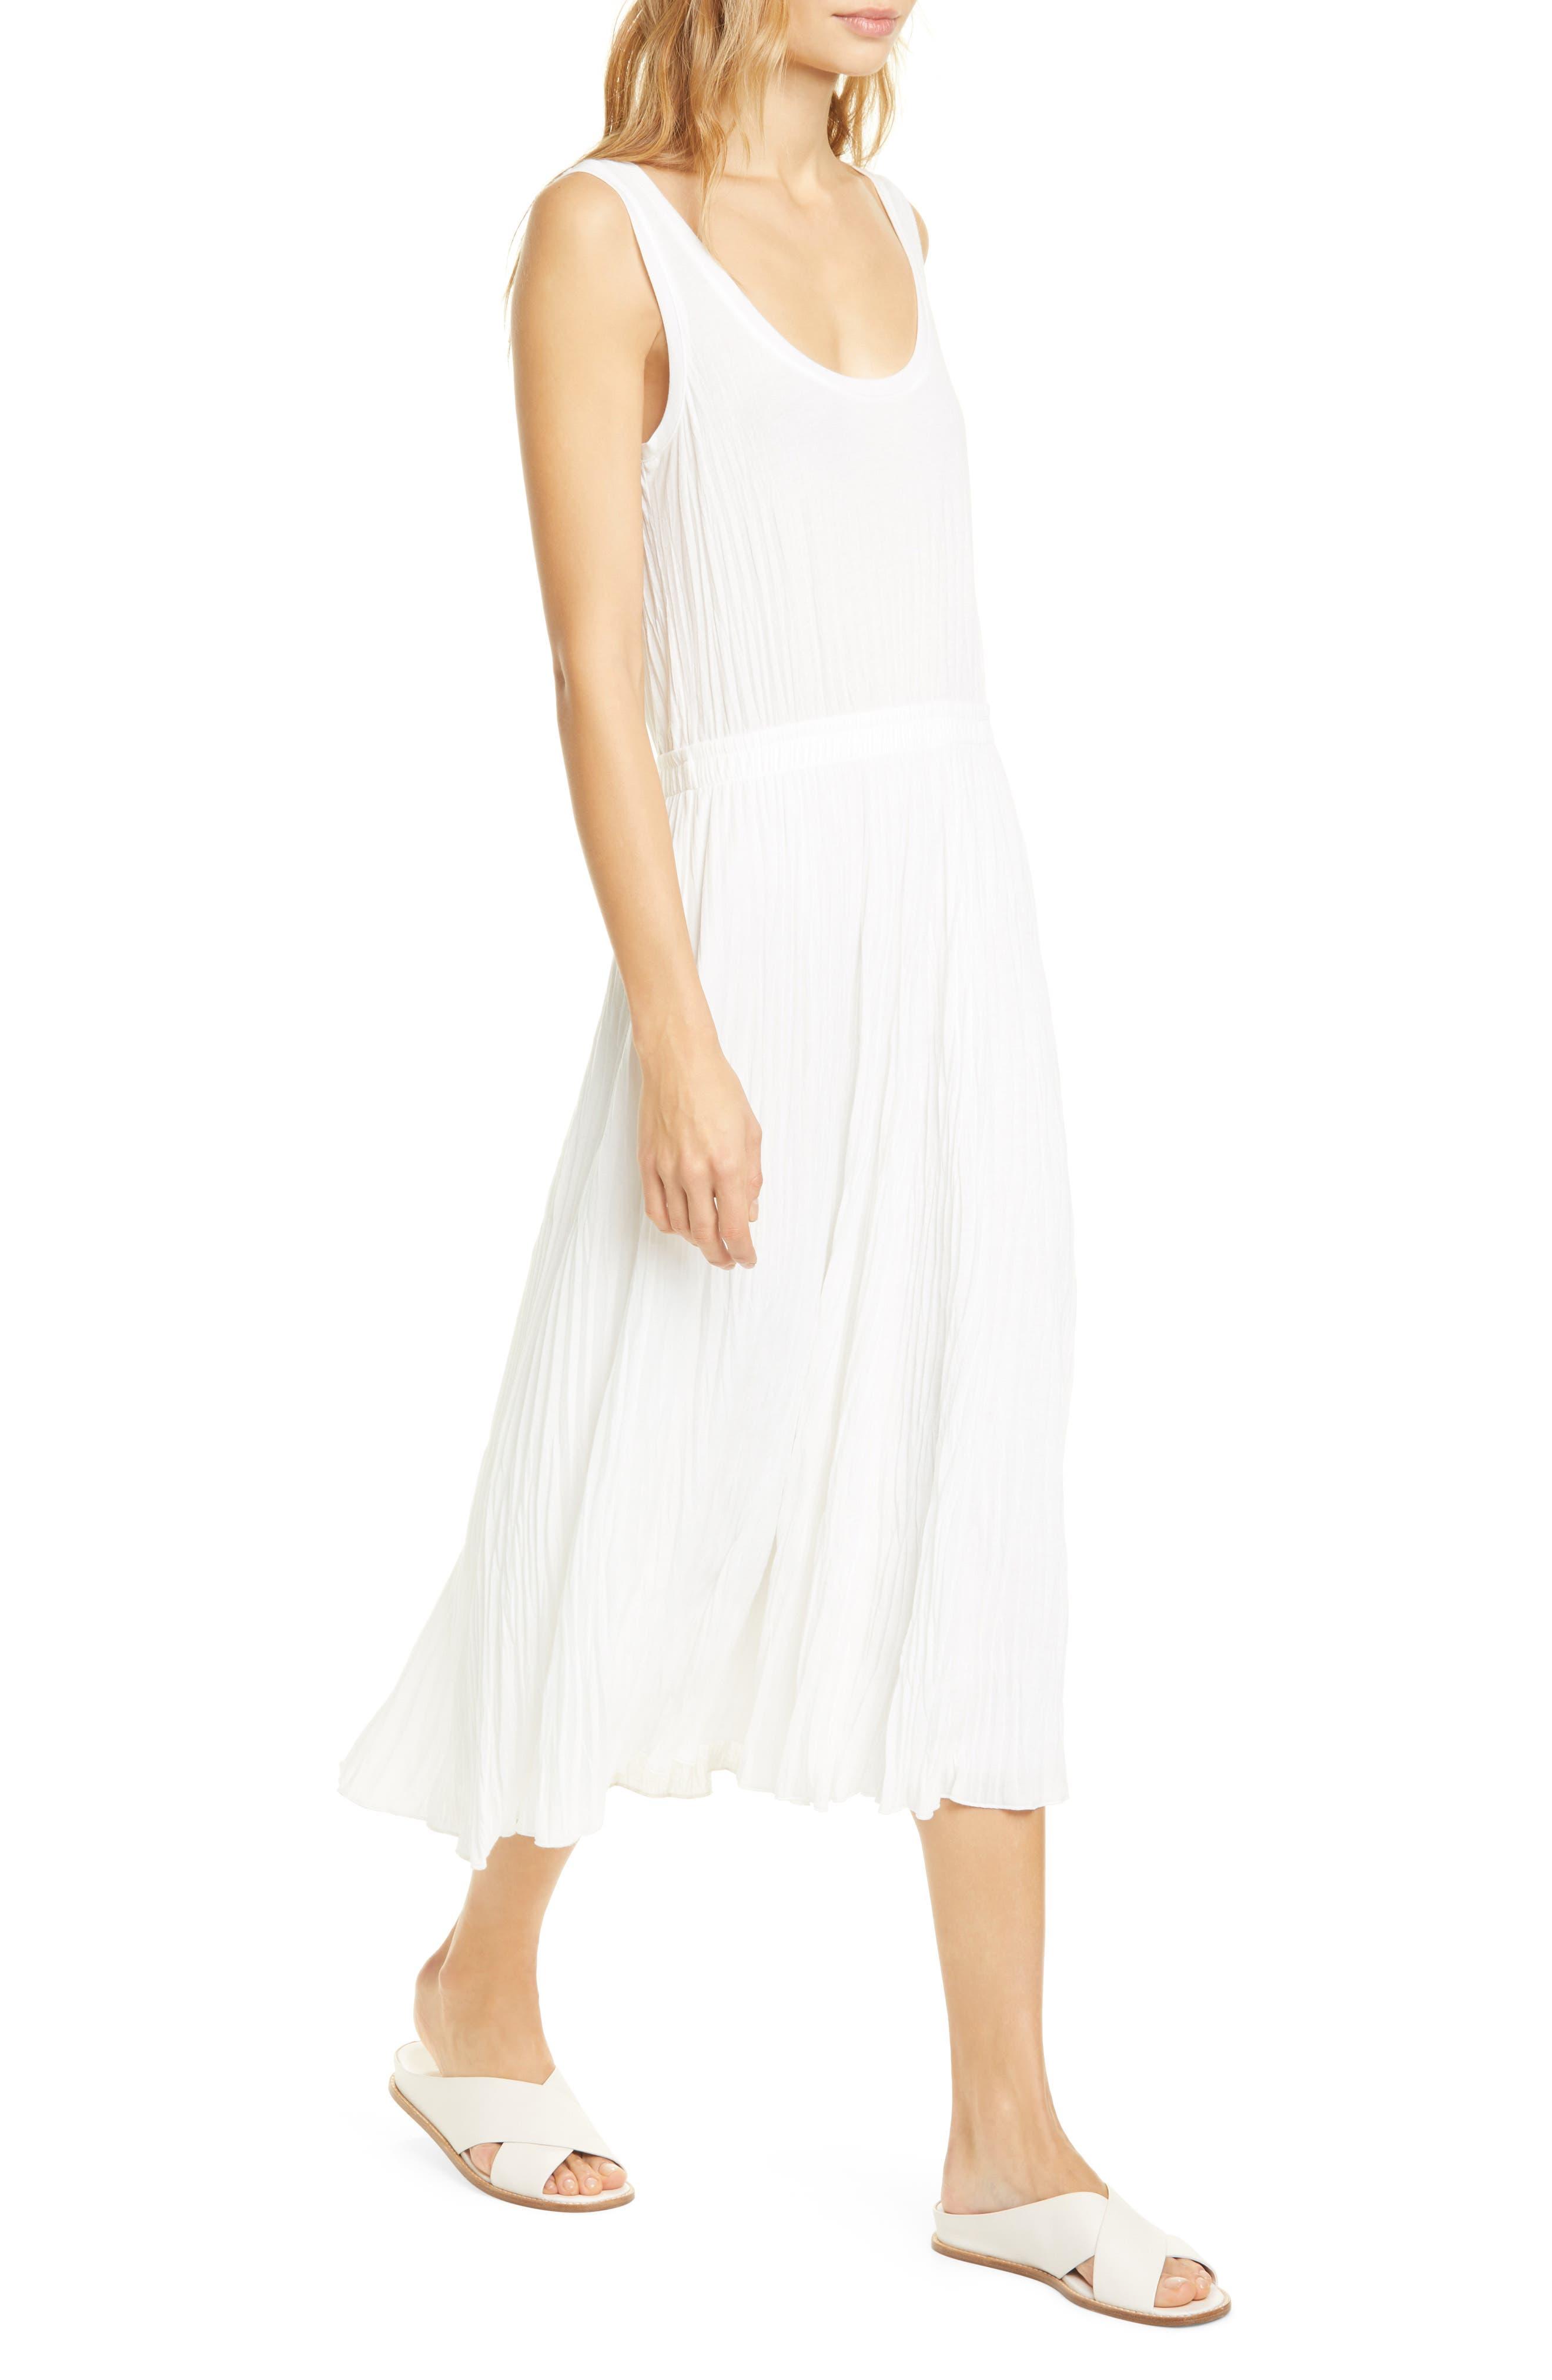 1920s Day Dresses, Tea Dresses, Mature Dresses with Sleeves Womens Vince Scoop Neck Pleated Tank Dress Size Medium - Ivory $171.00 AT vintagedancer.com